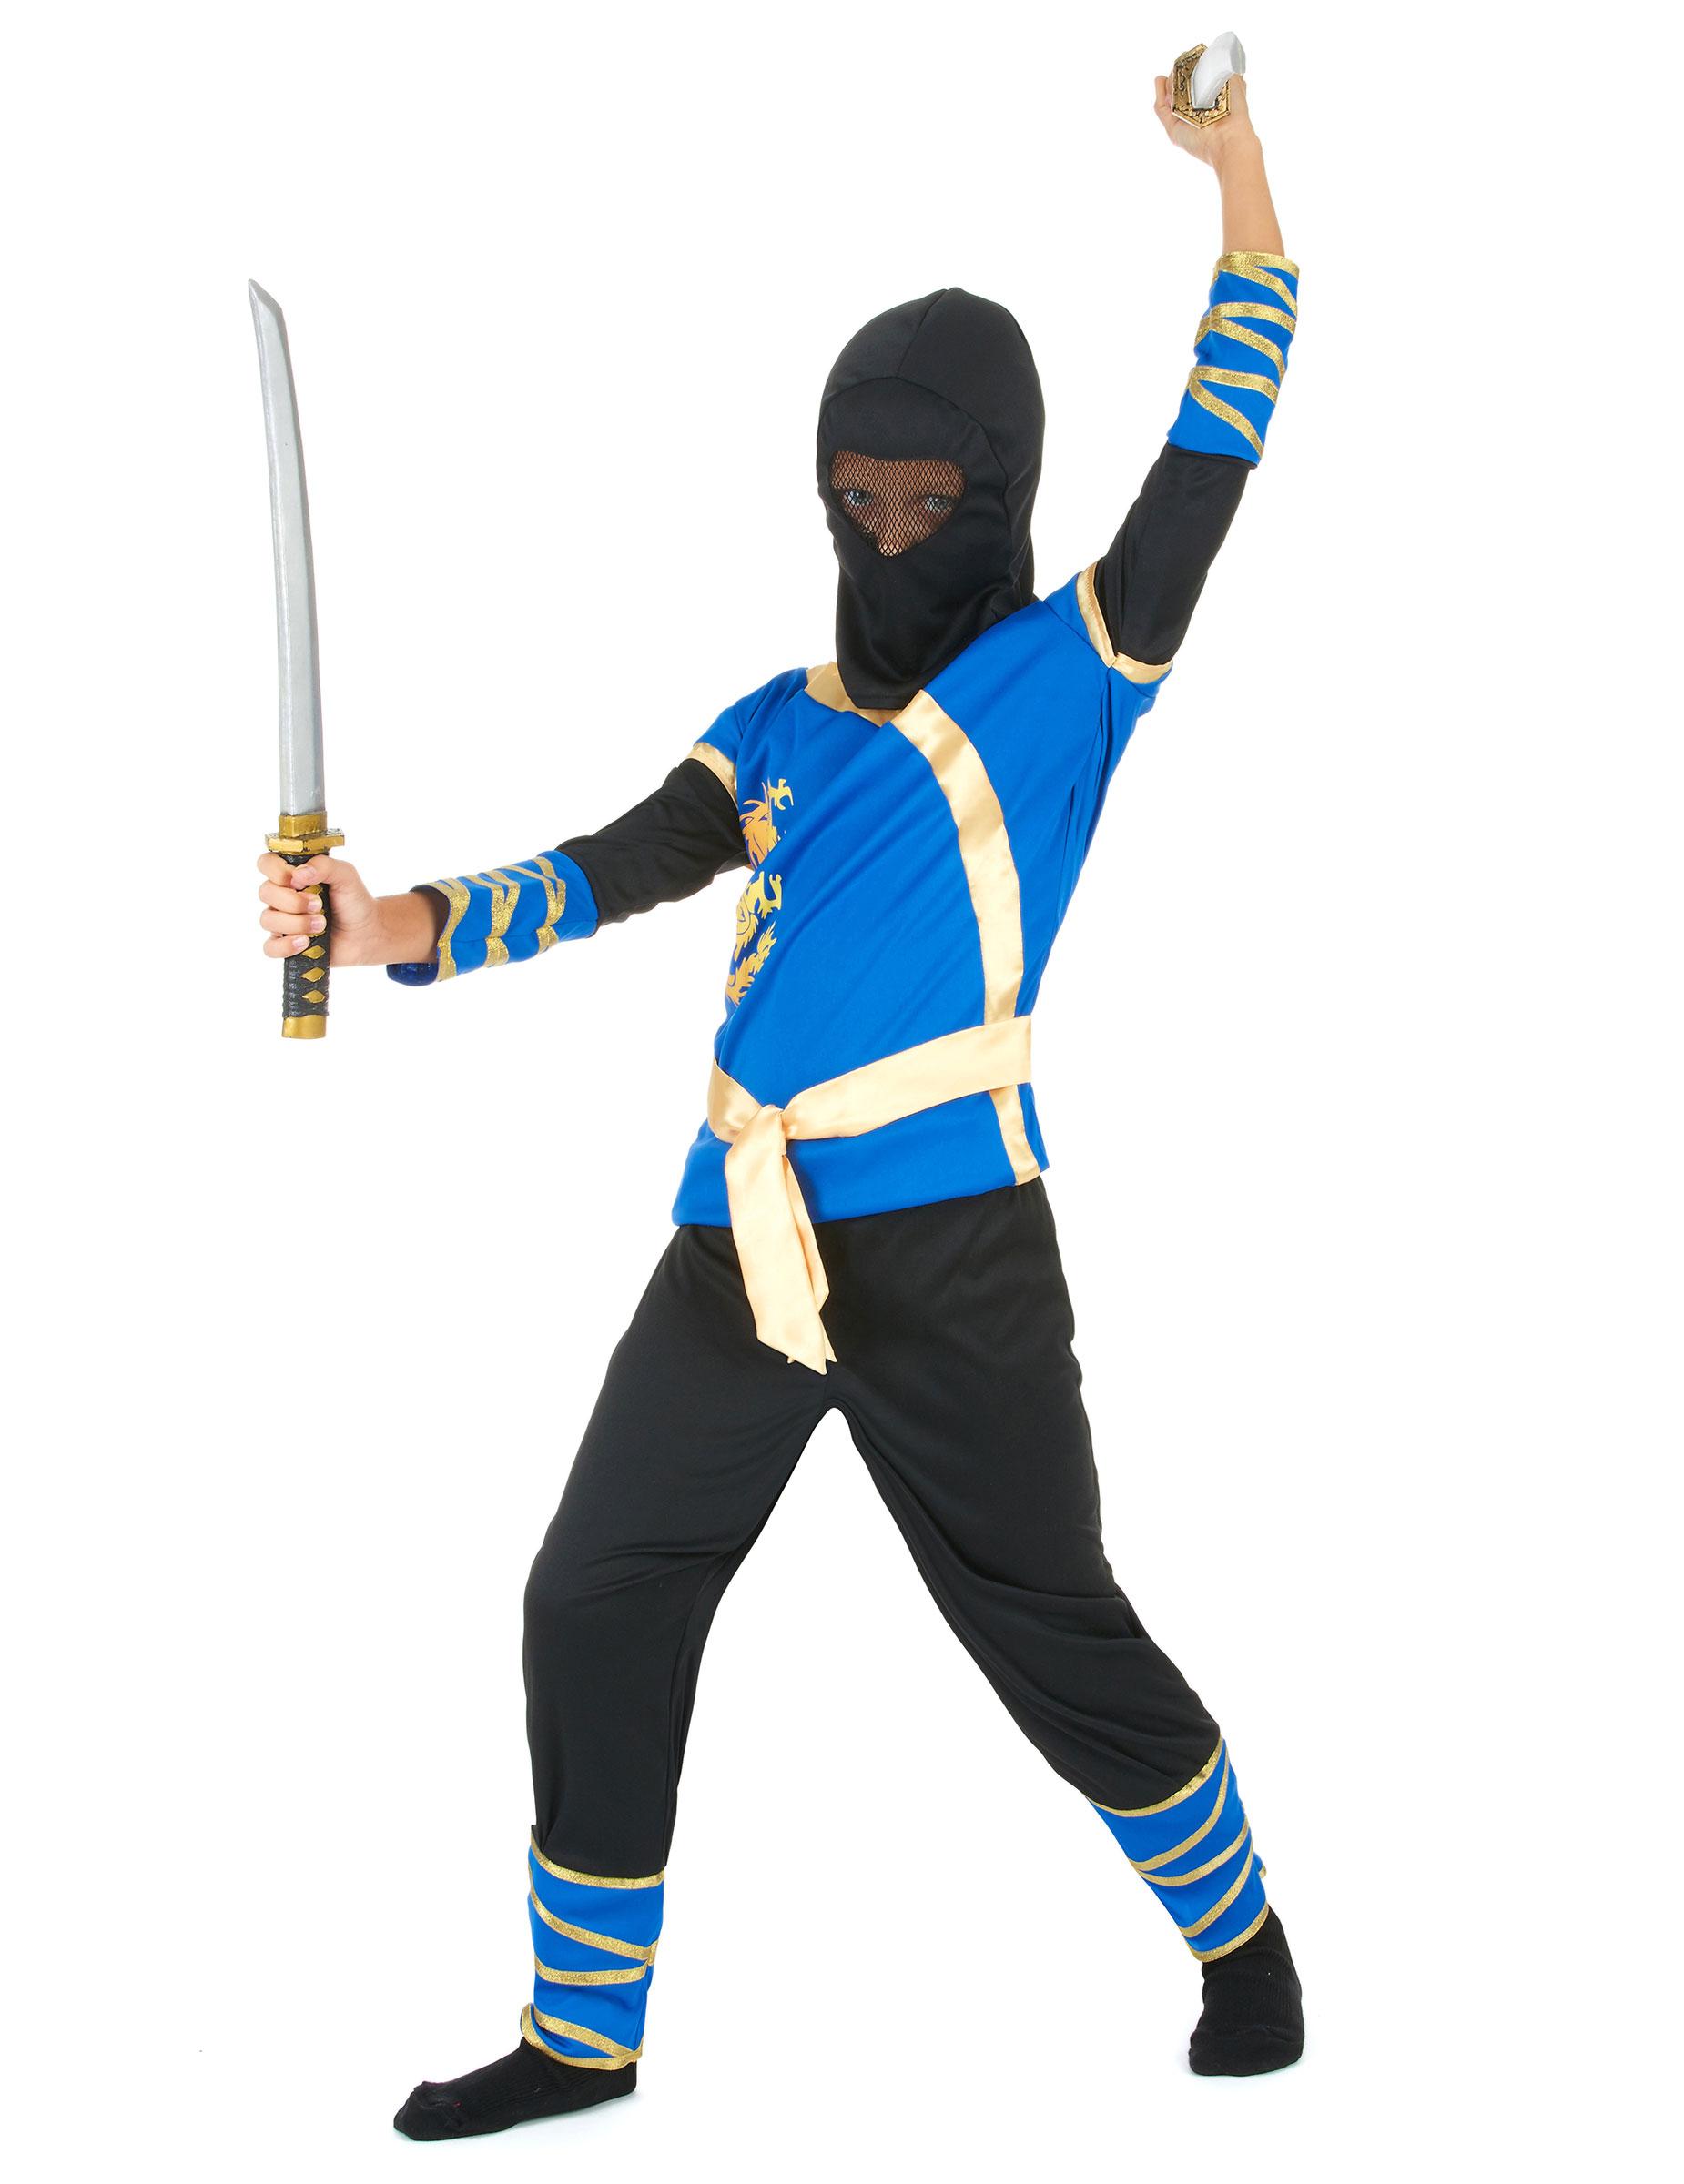 50374757b24df Déguisement ninja bleu et or garçon   Deguise-toi